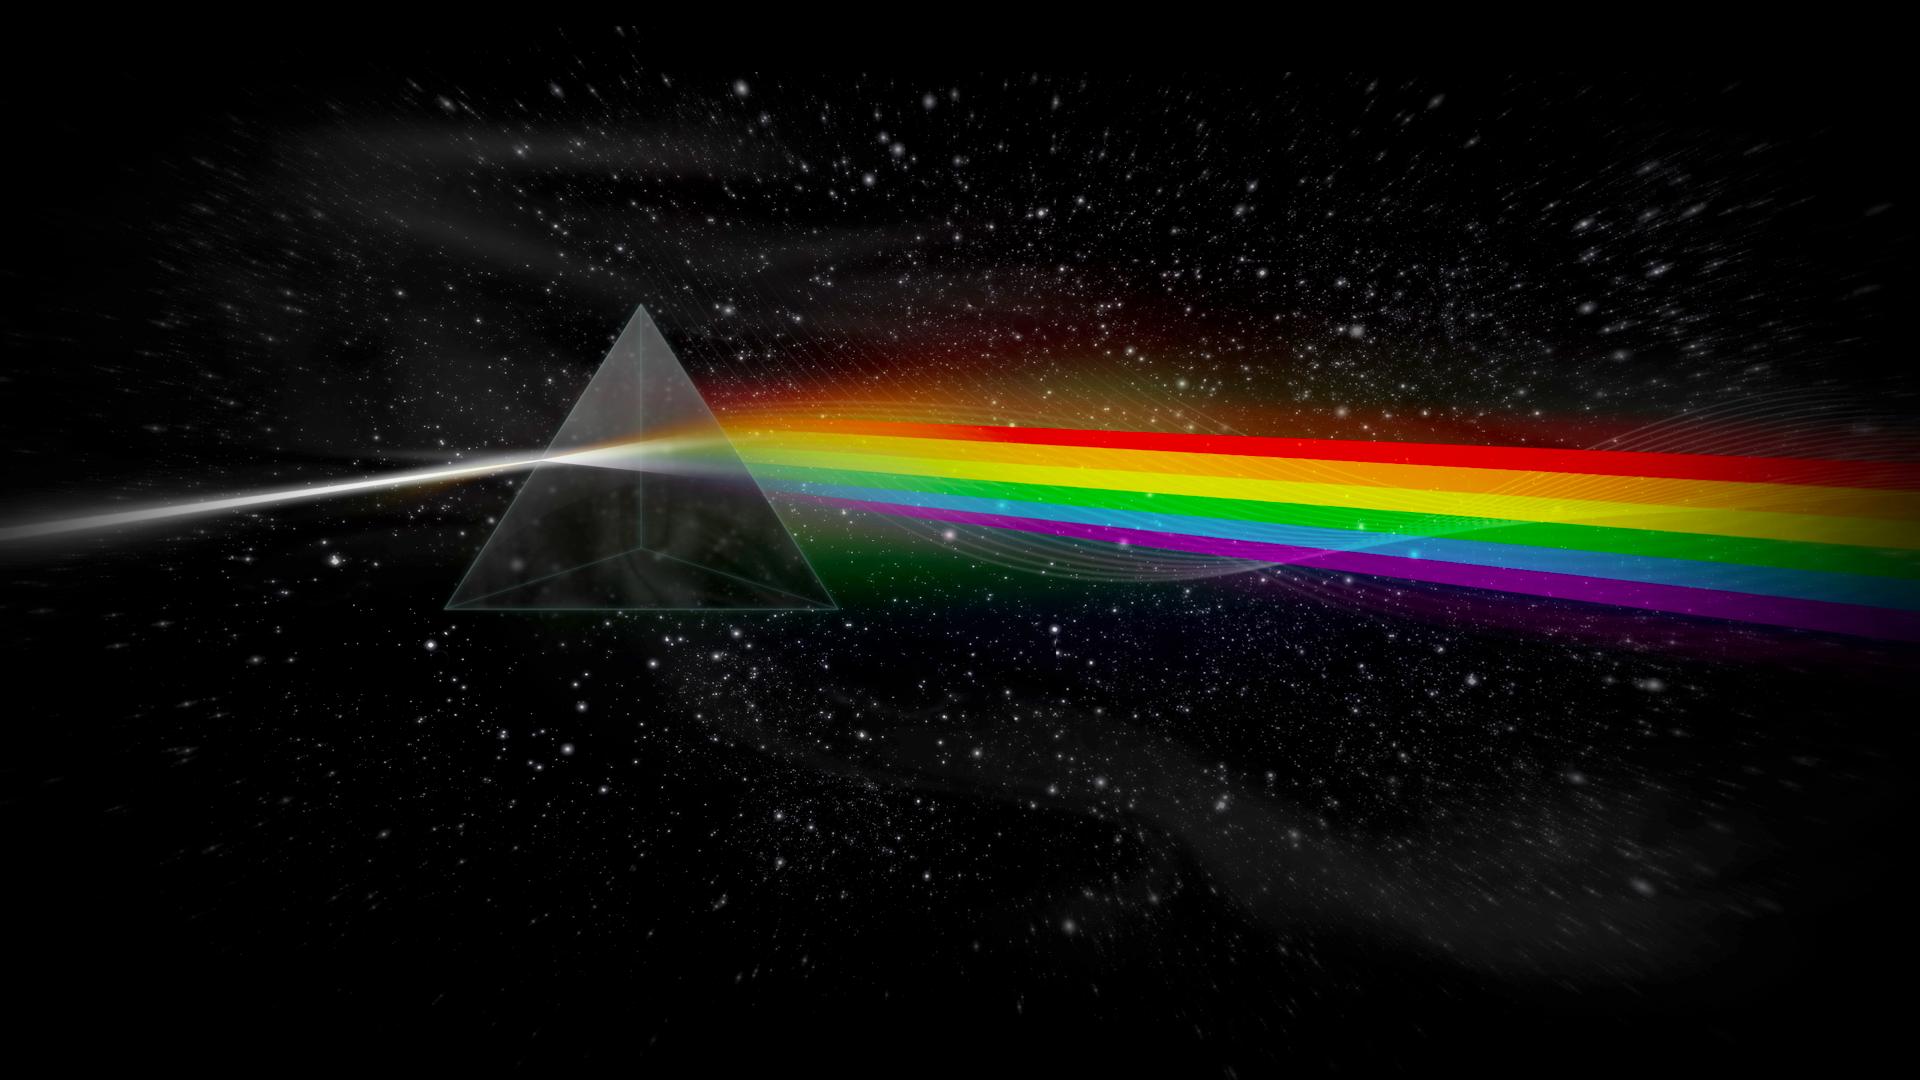 Pink Floyd Wallpapers HD [Recomendado]   Taringa 1920x1080